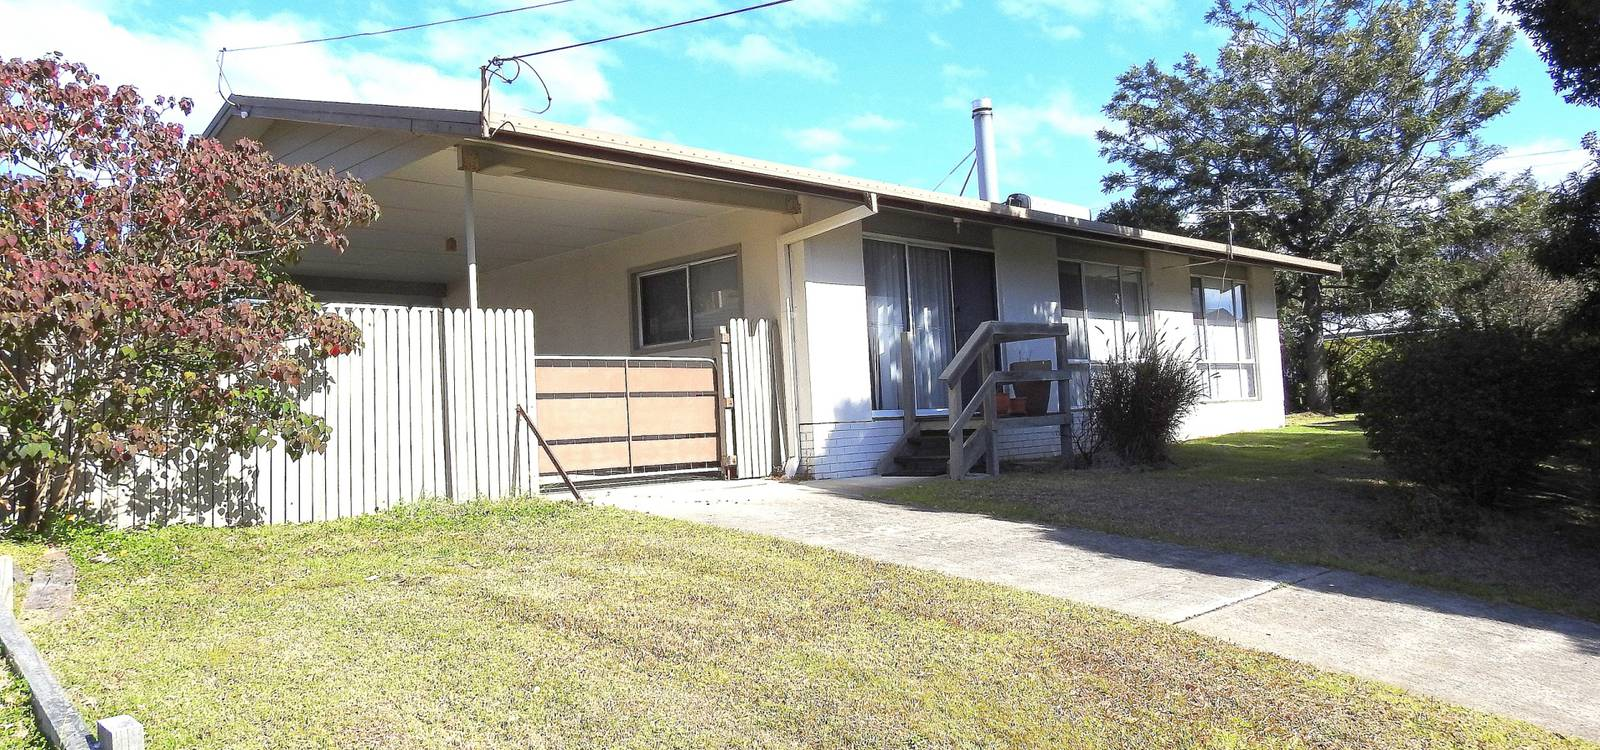 31 Anderson Avenue TUROSS HEAD, NSW 2537 - photo 1